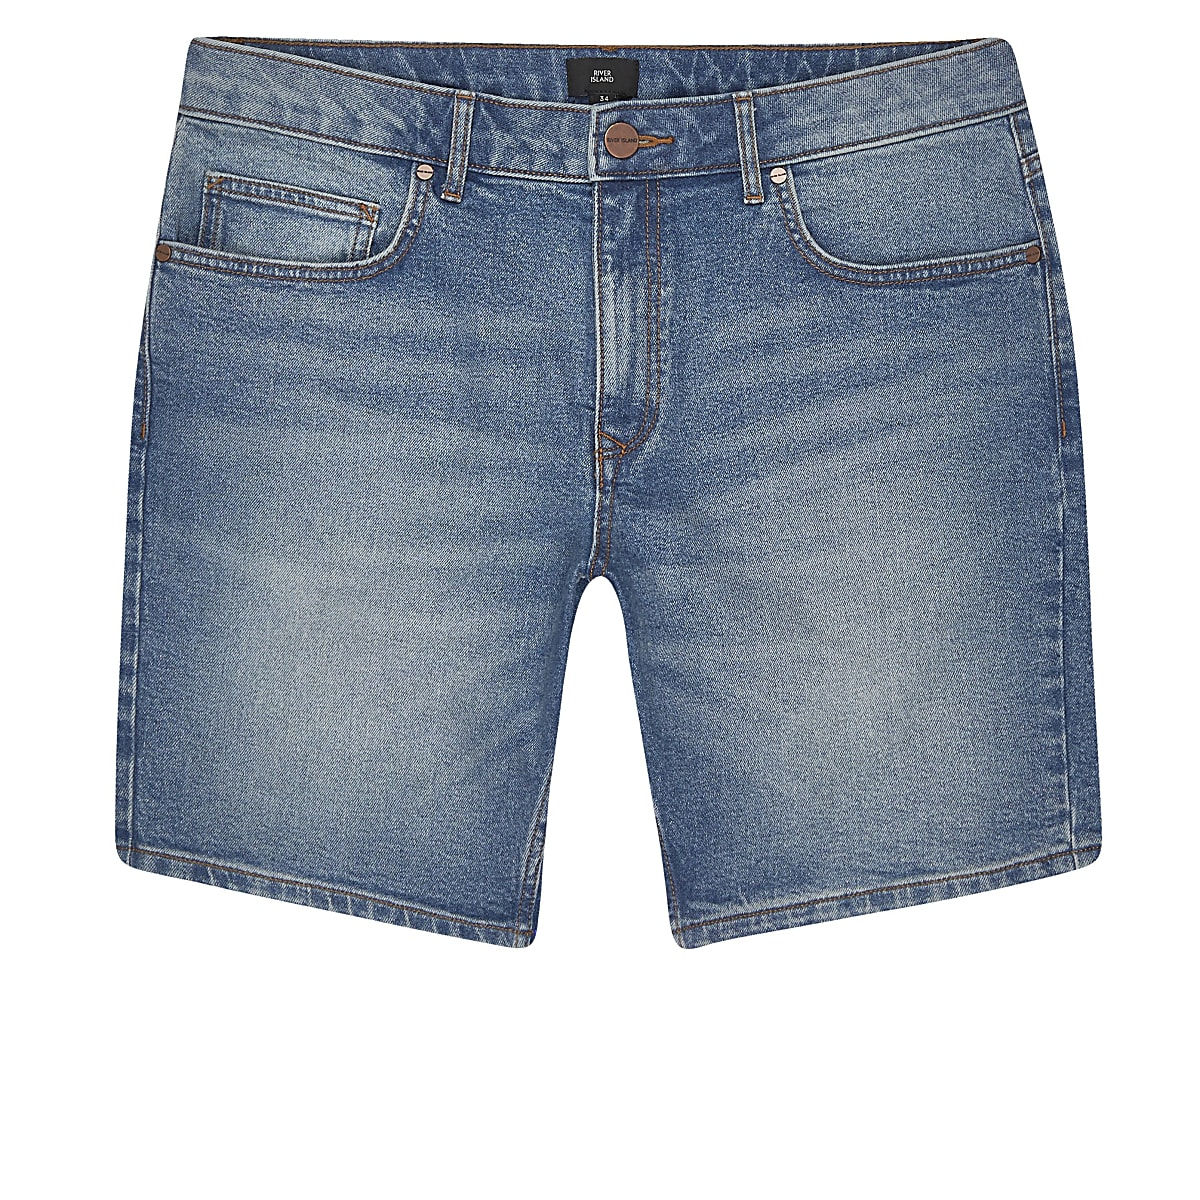 Big and Tall - Blauwe slim-fit denim short